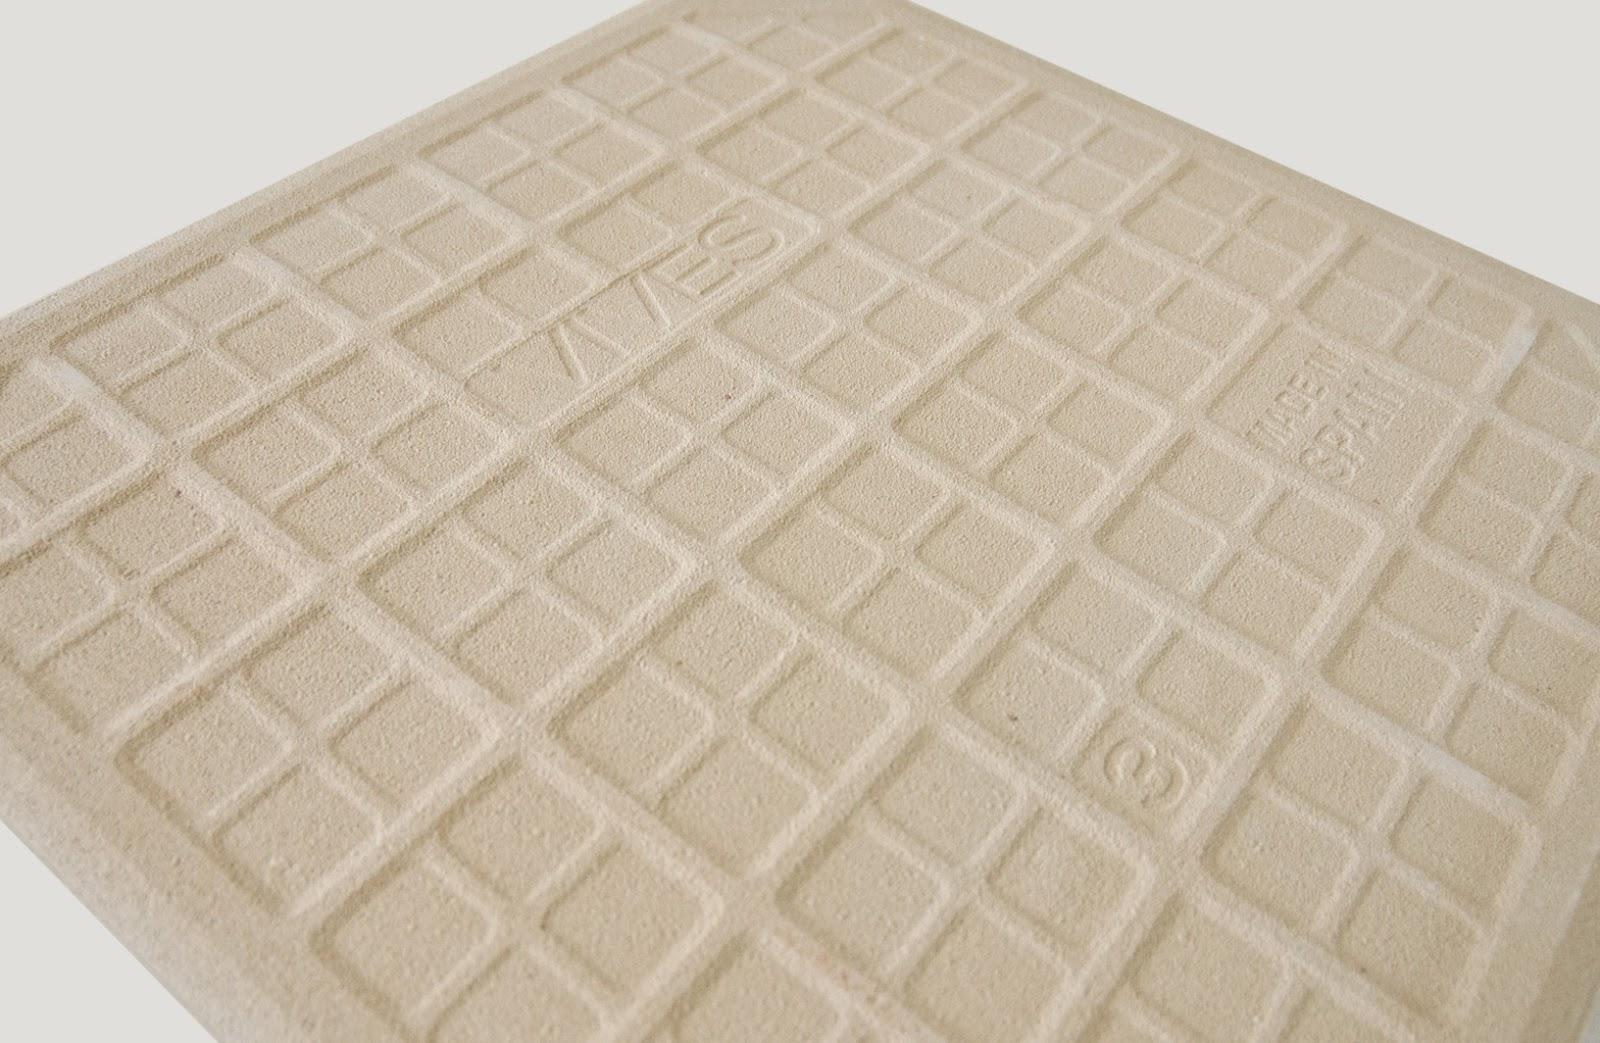 Eugenio pereda s a qu posibilidades nos ofrece el azulejo for Fabrica ceramica blanca